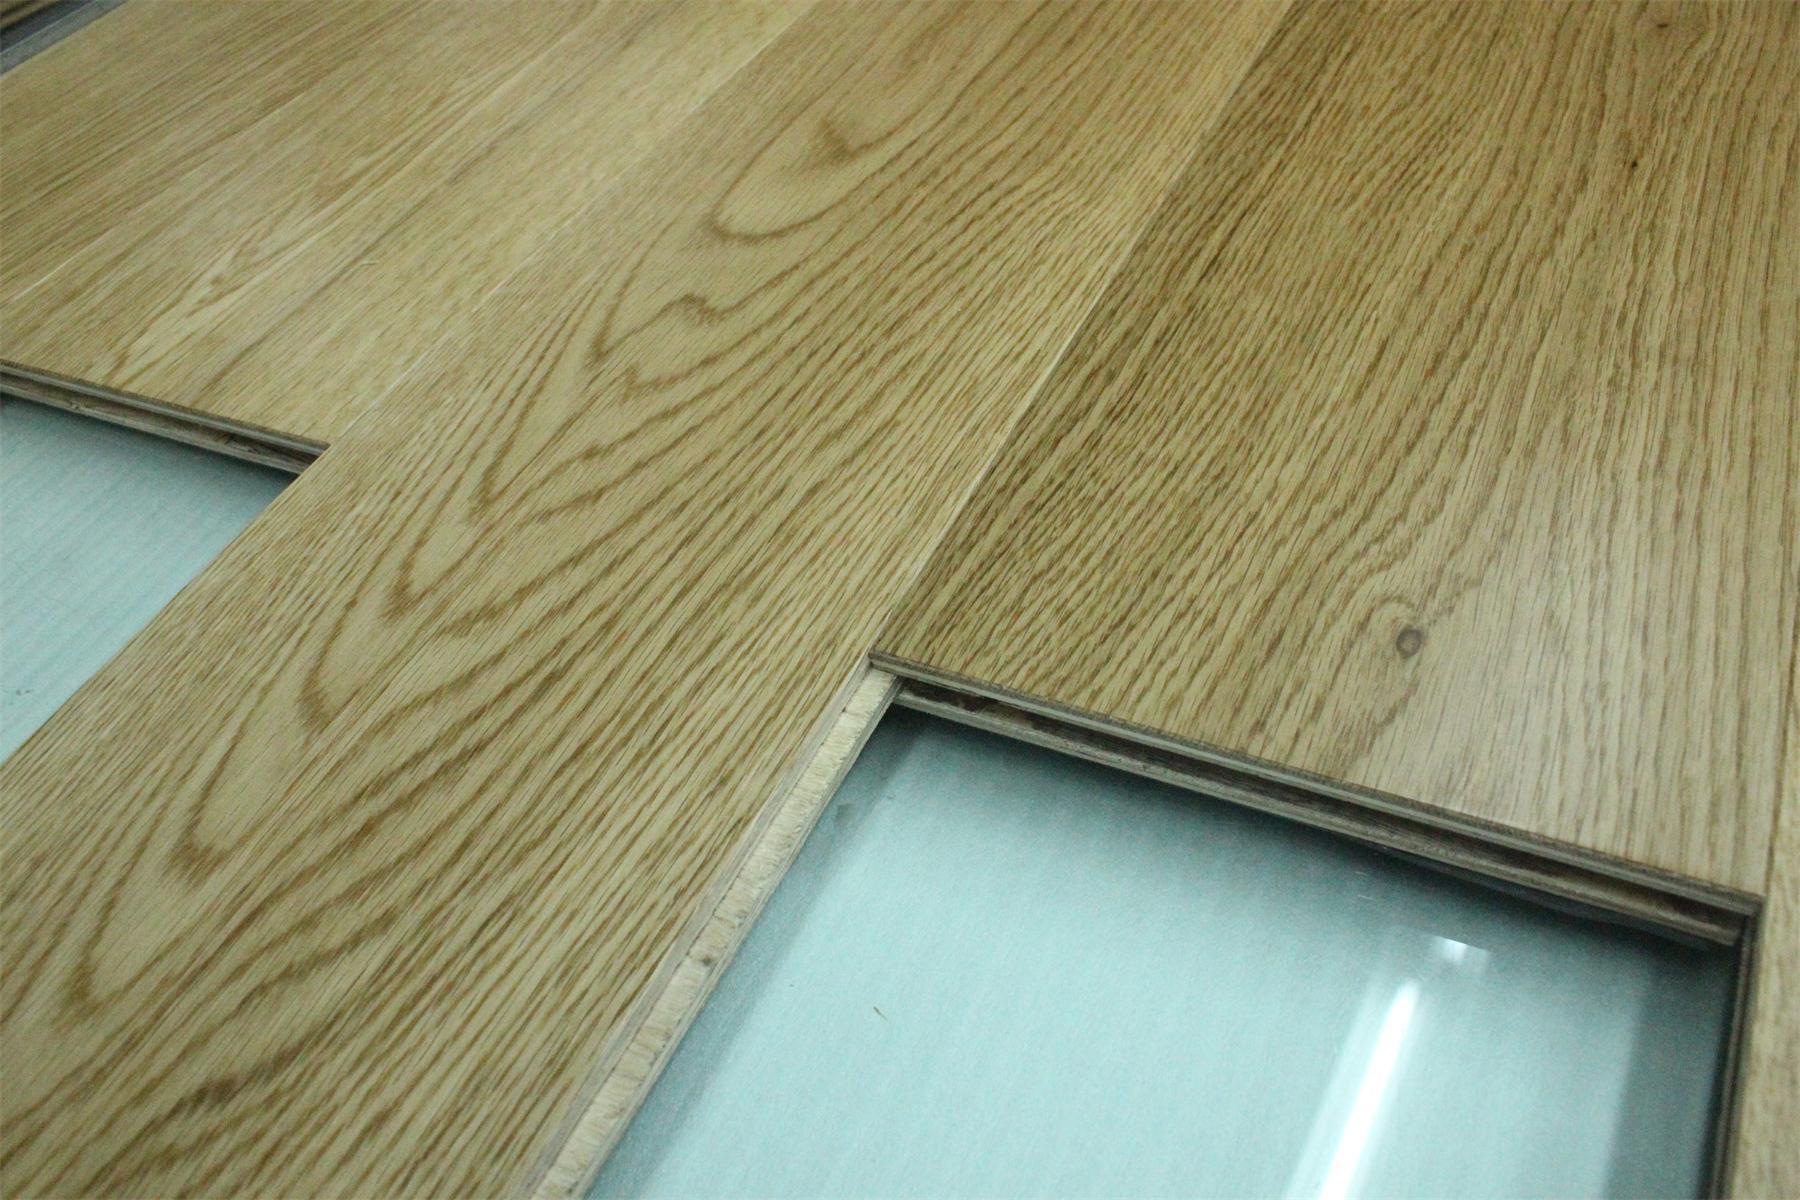 China Ab Grade Wax Oil Wide Plank Oak Flooring Wood Engineered